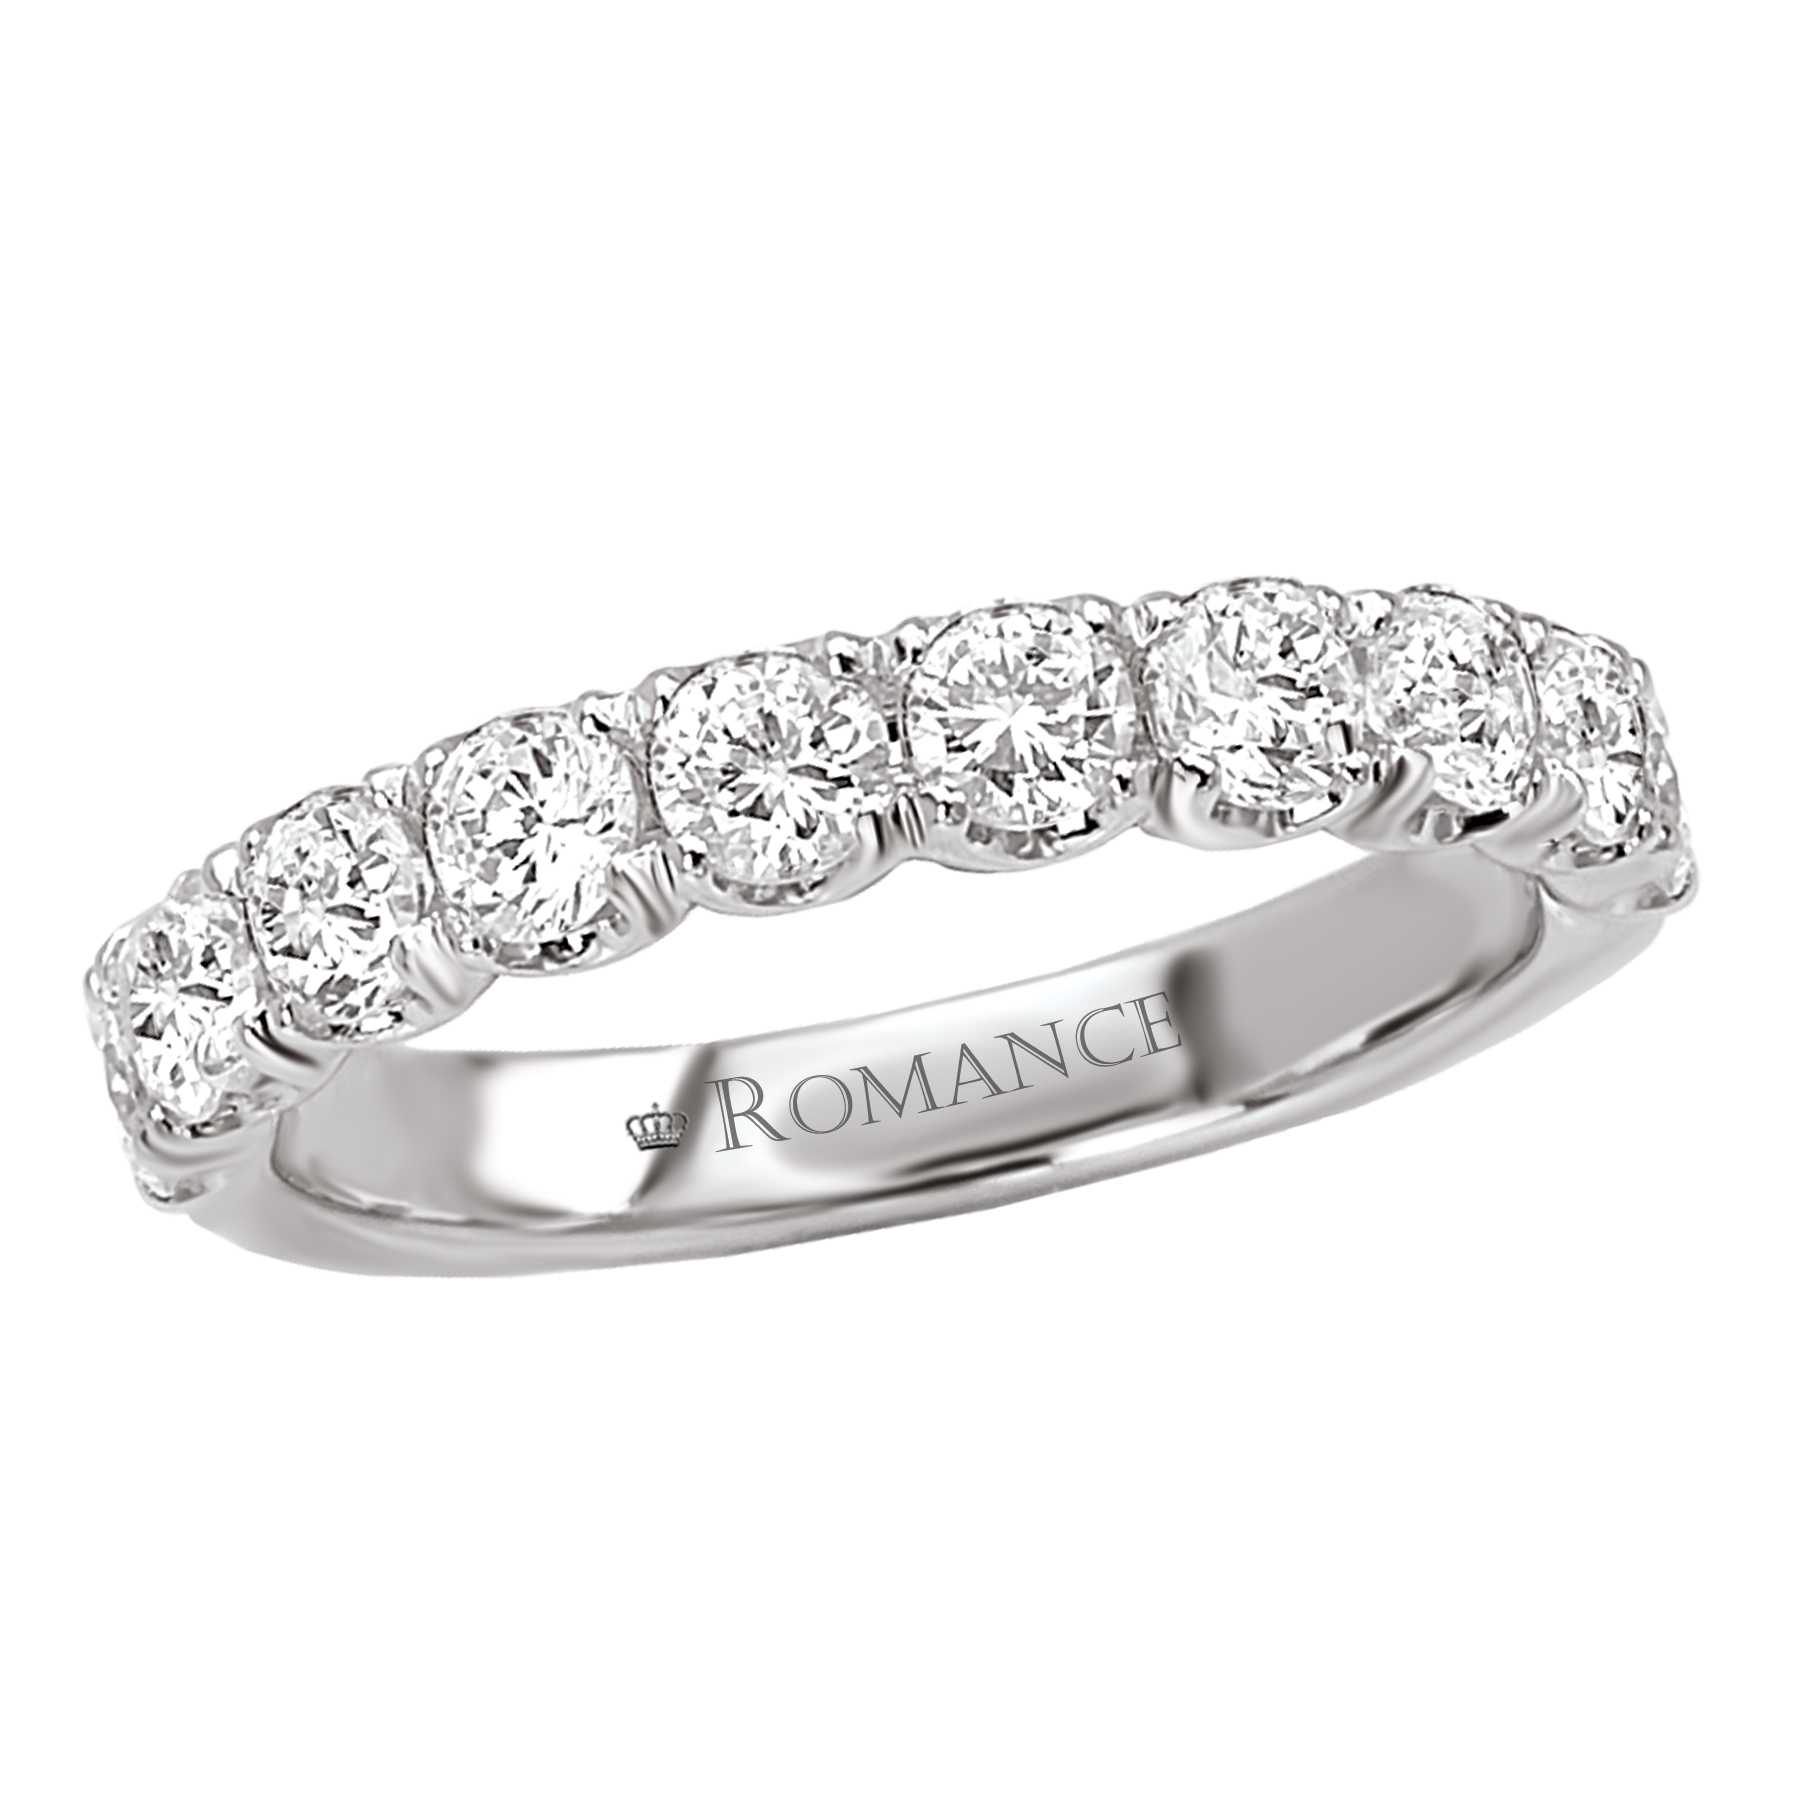 Romantic Bands: Buy Romance 117271-W Wedding Bands